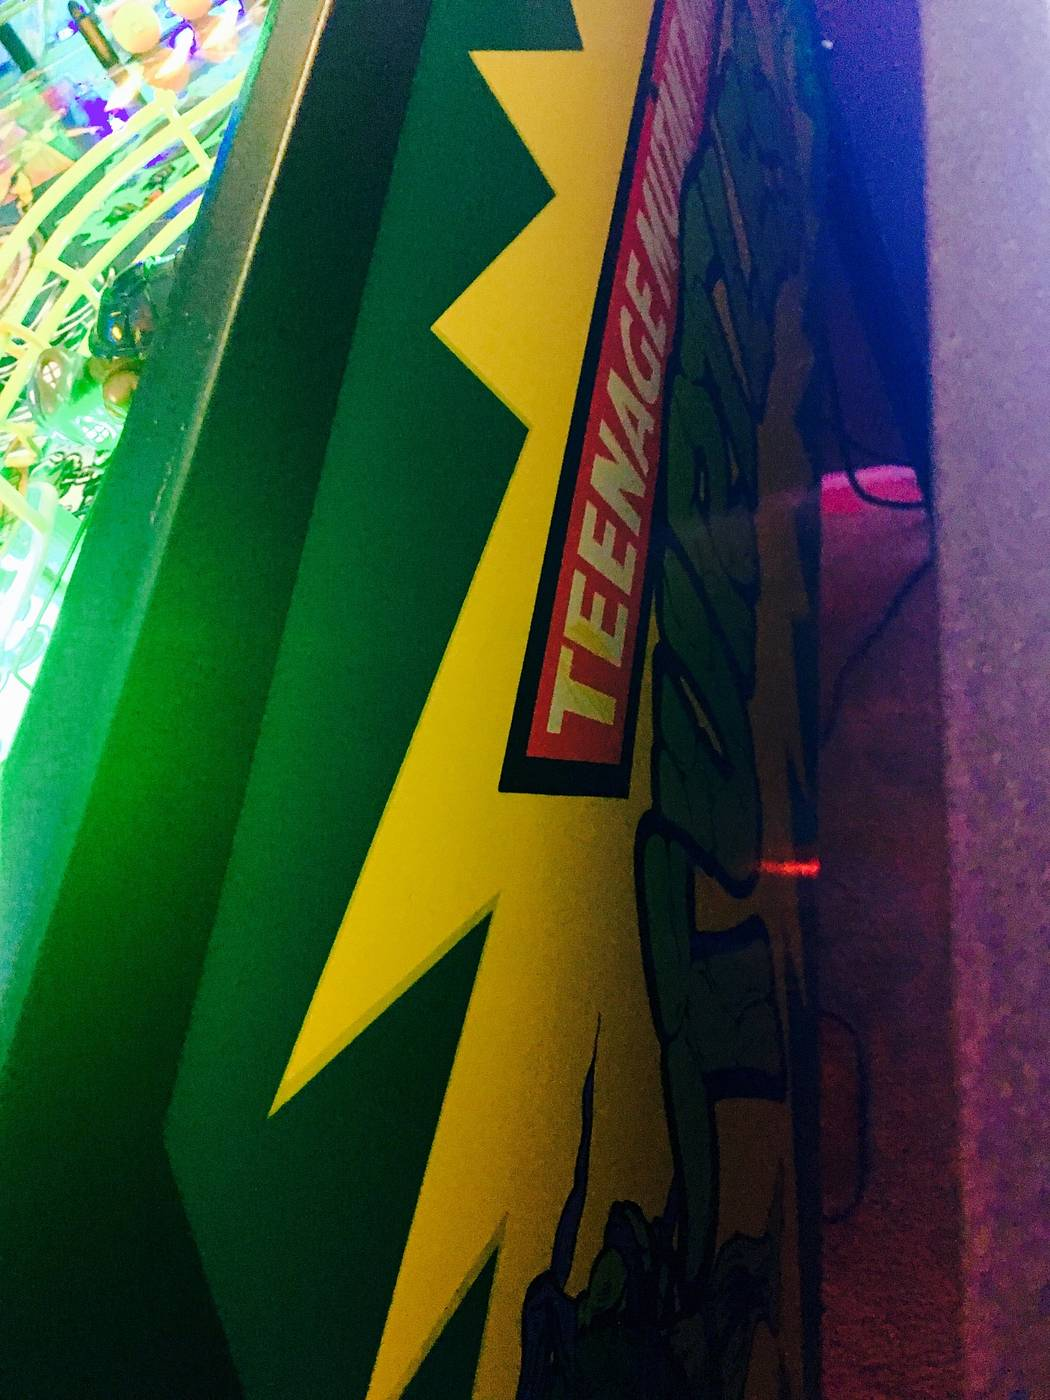 turtles pinball machine for sale